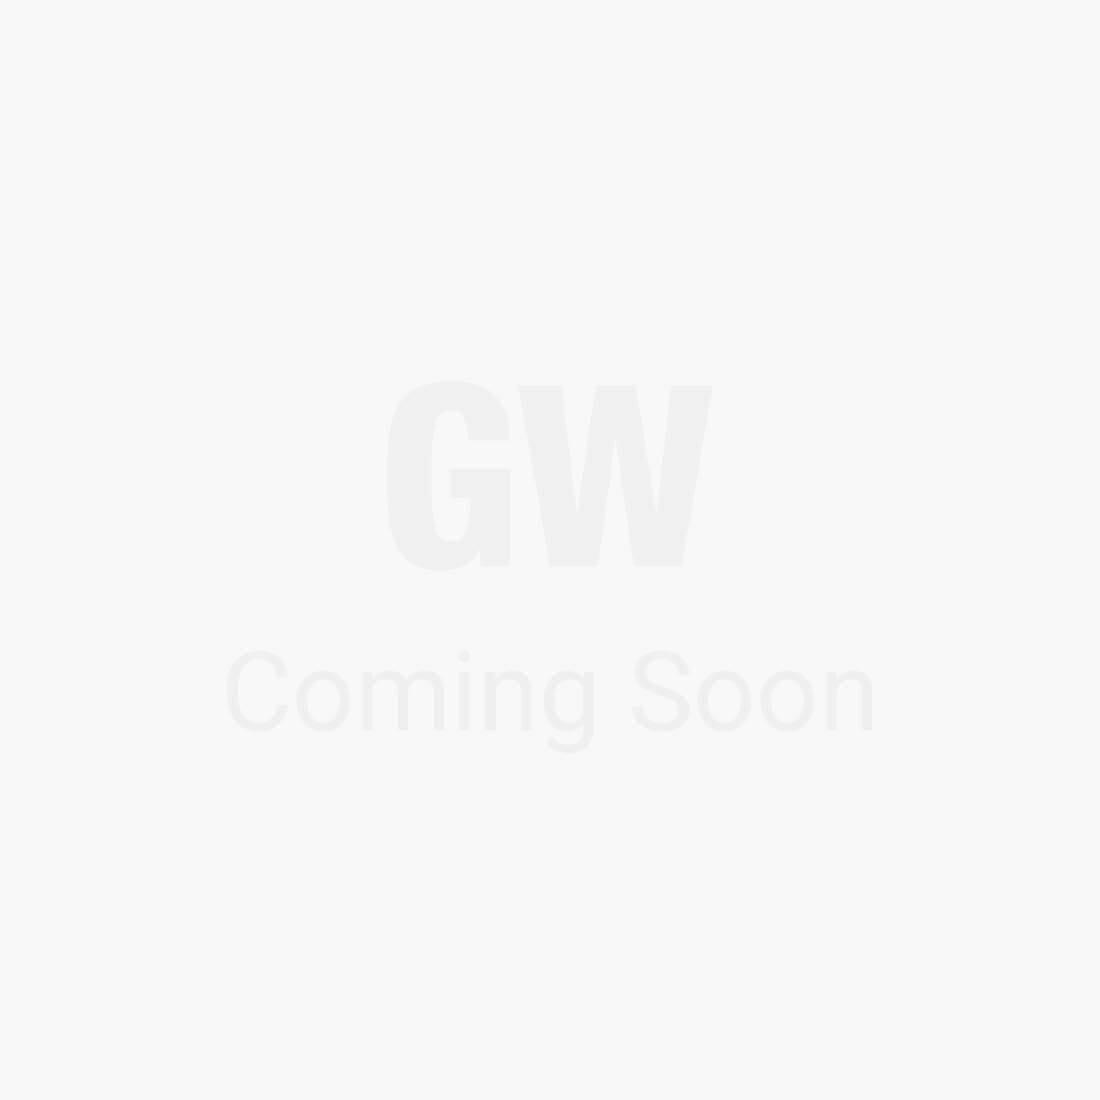 Wilomena 1 Seater Sofa